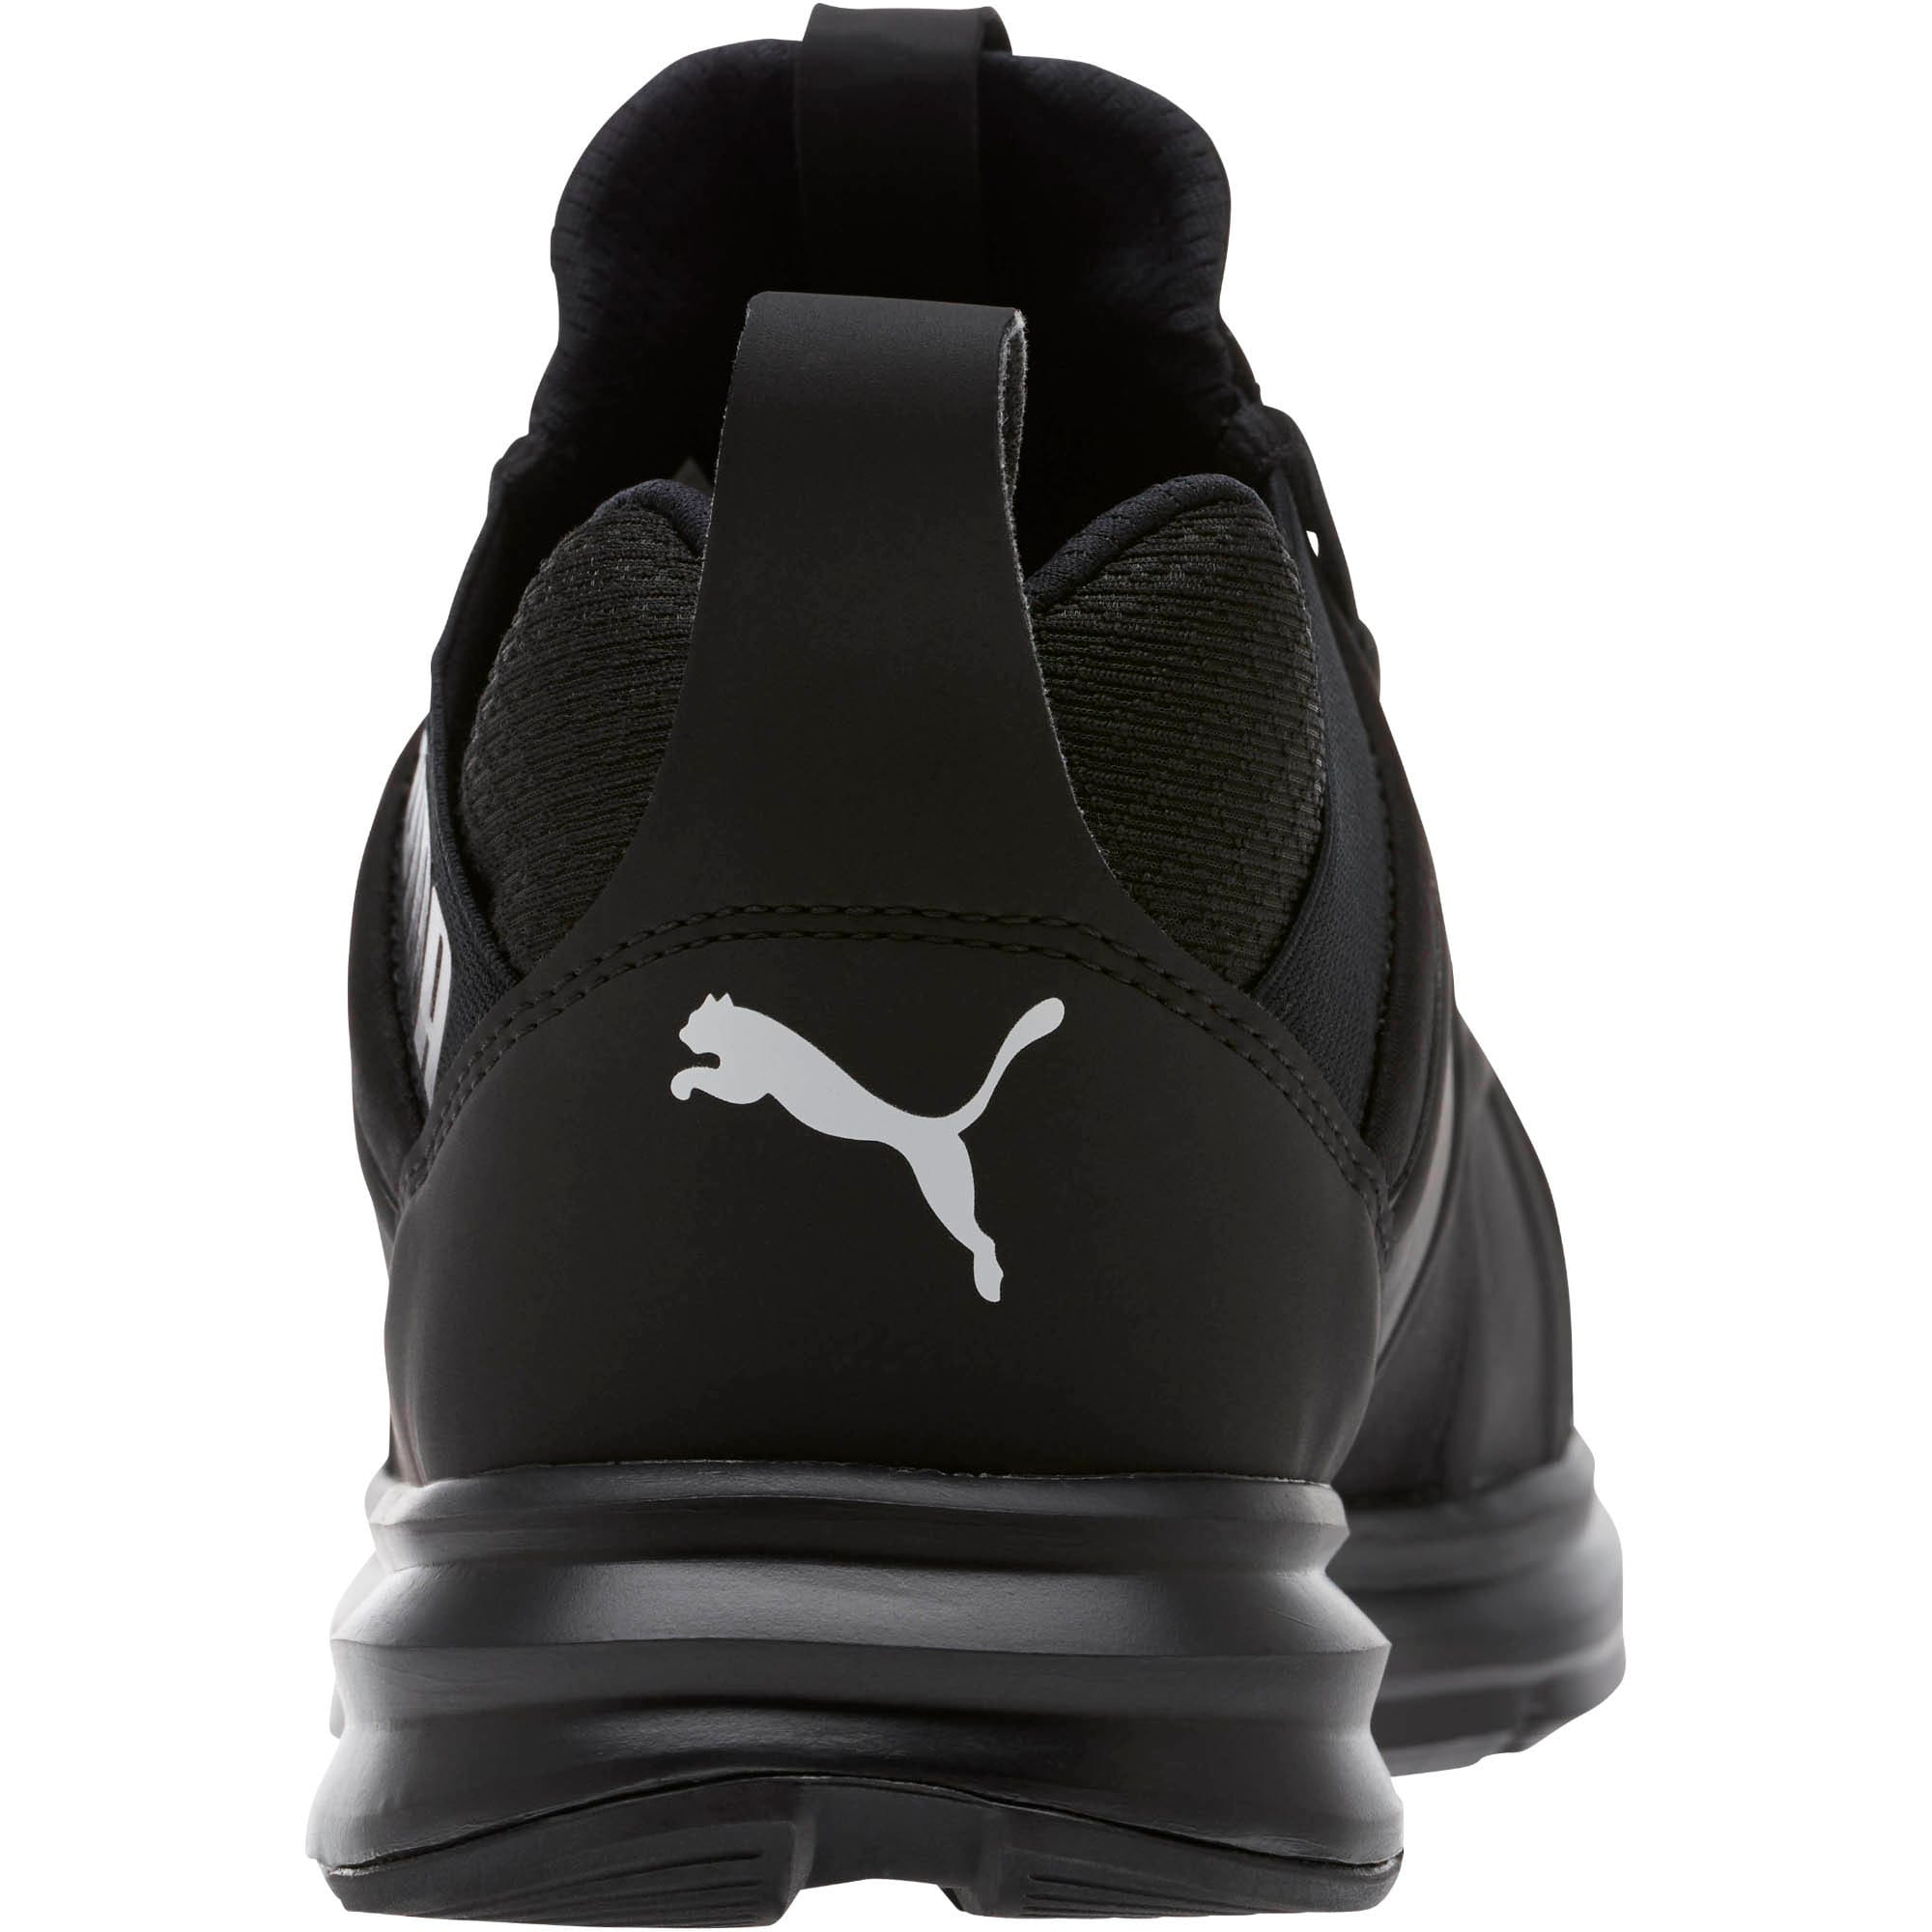 Thumbnail 4 of Enzo Wide Men's Training Shoes, Puma Black, medium